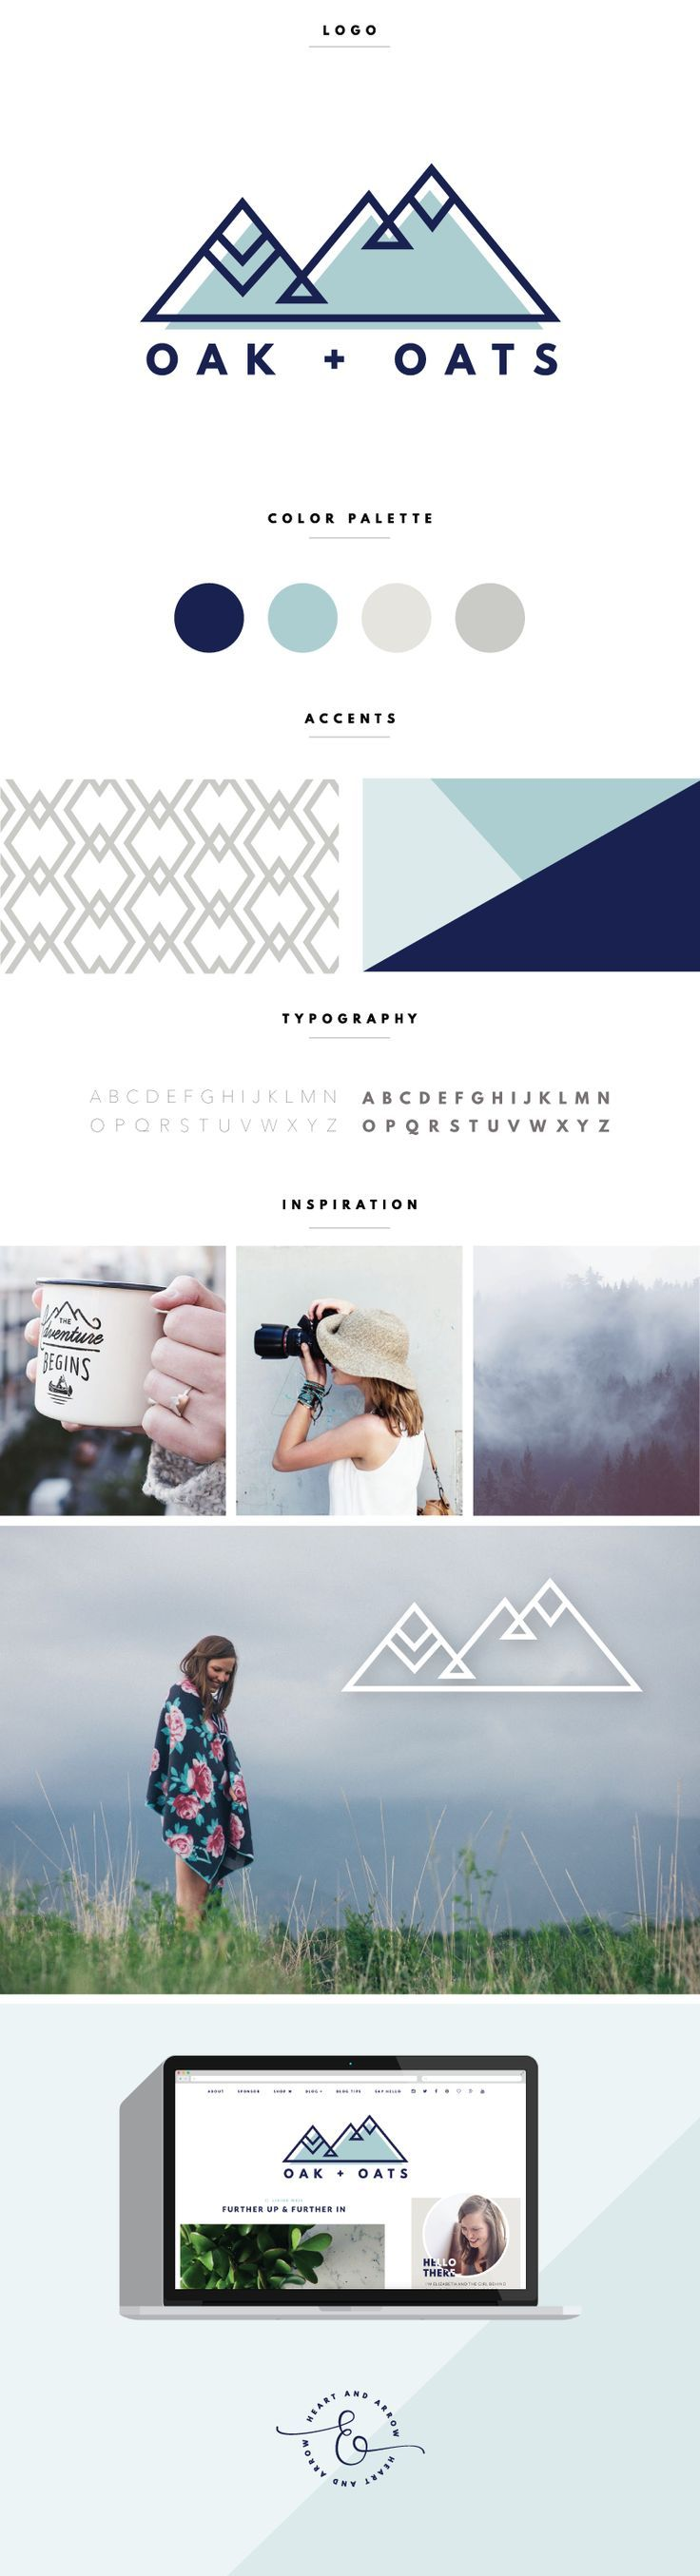 21 best Brand Identity images on Pinterest